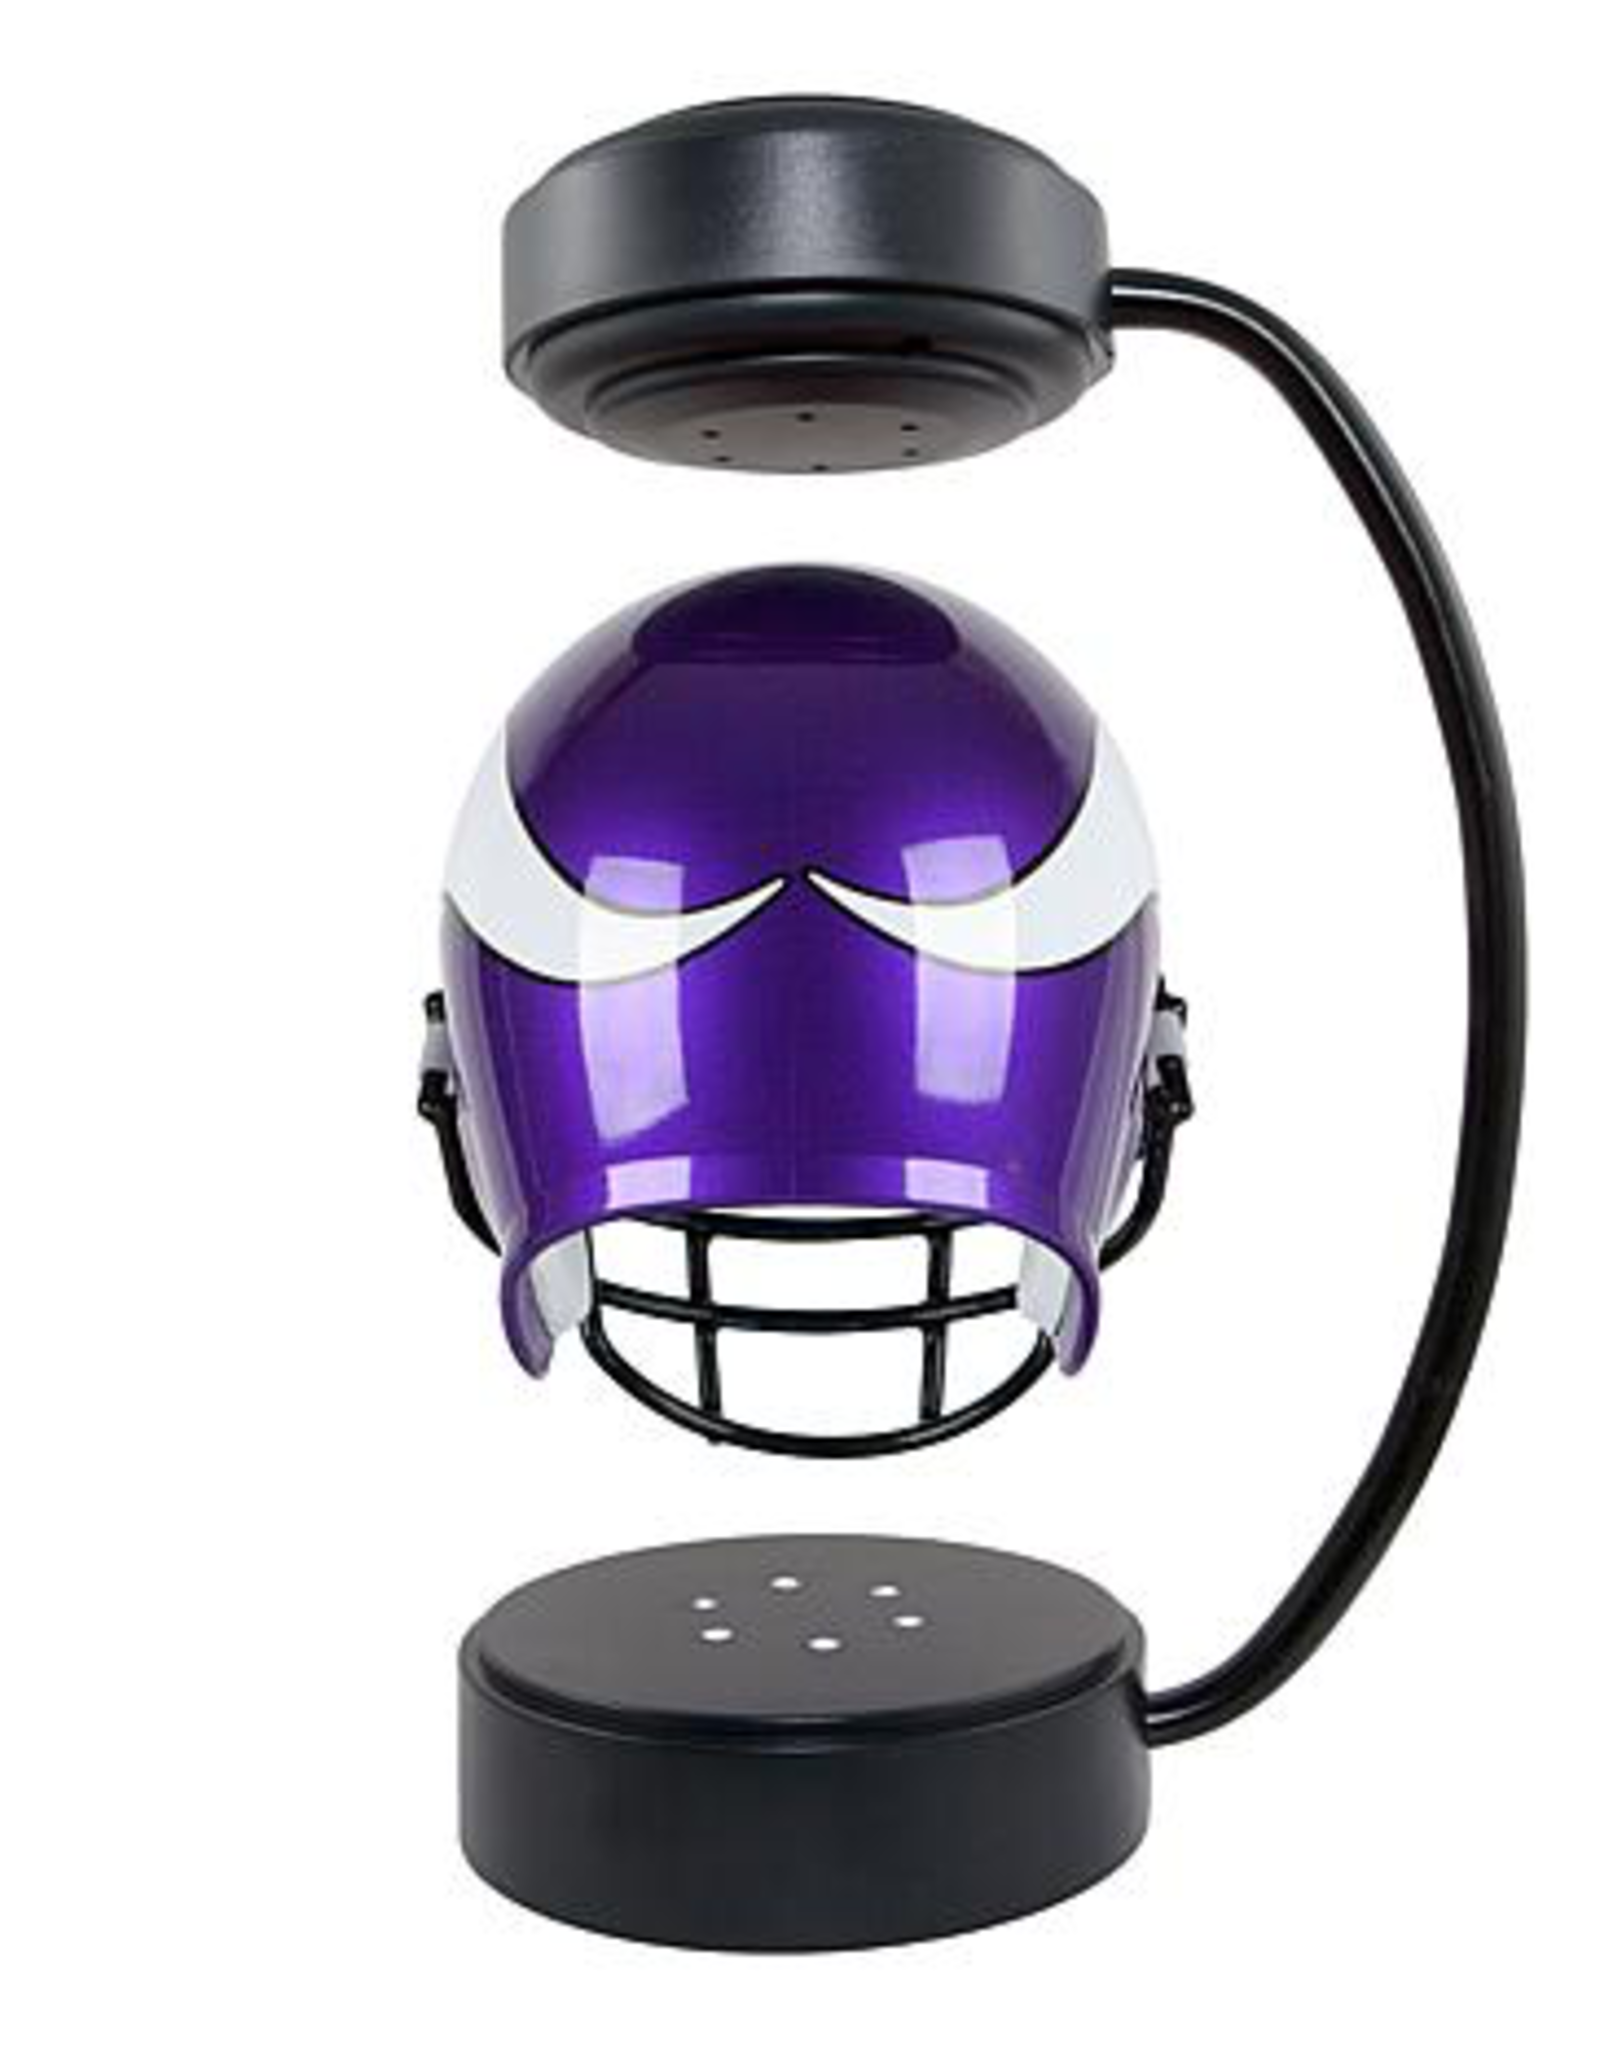 HOVER HELMETS Minnesota Vikings Collectible Levitating Hover Helmet